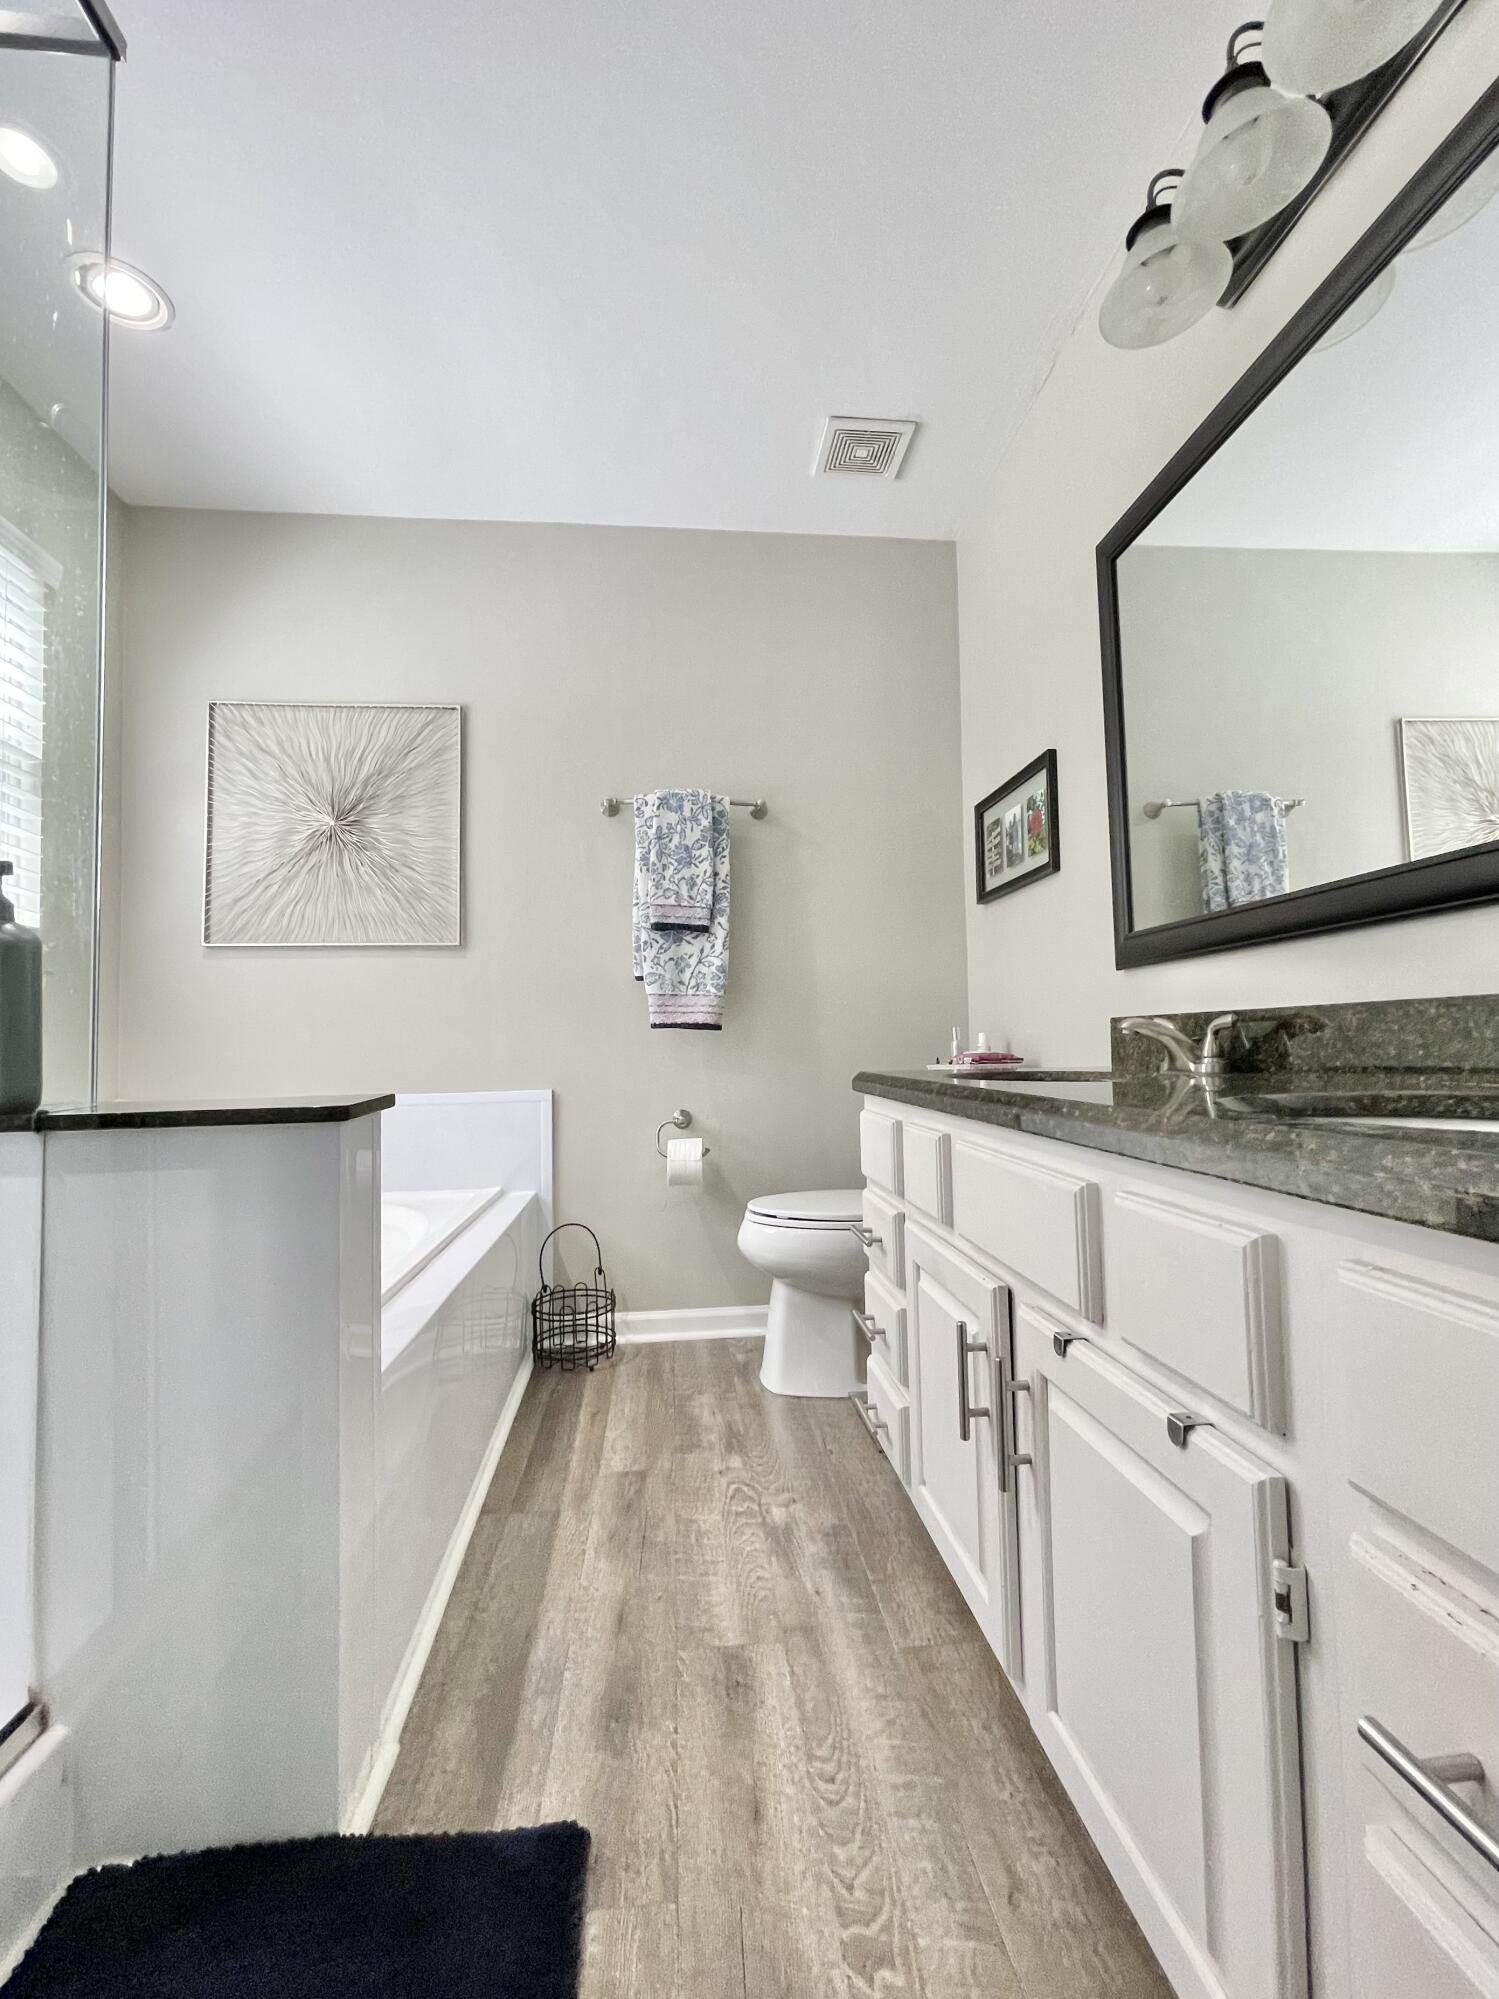 Quail Hollow Homes For Sale - 1364 Downsberry, Mount Pleasant, SC - 3